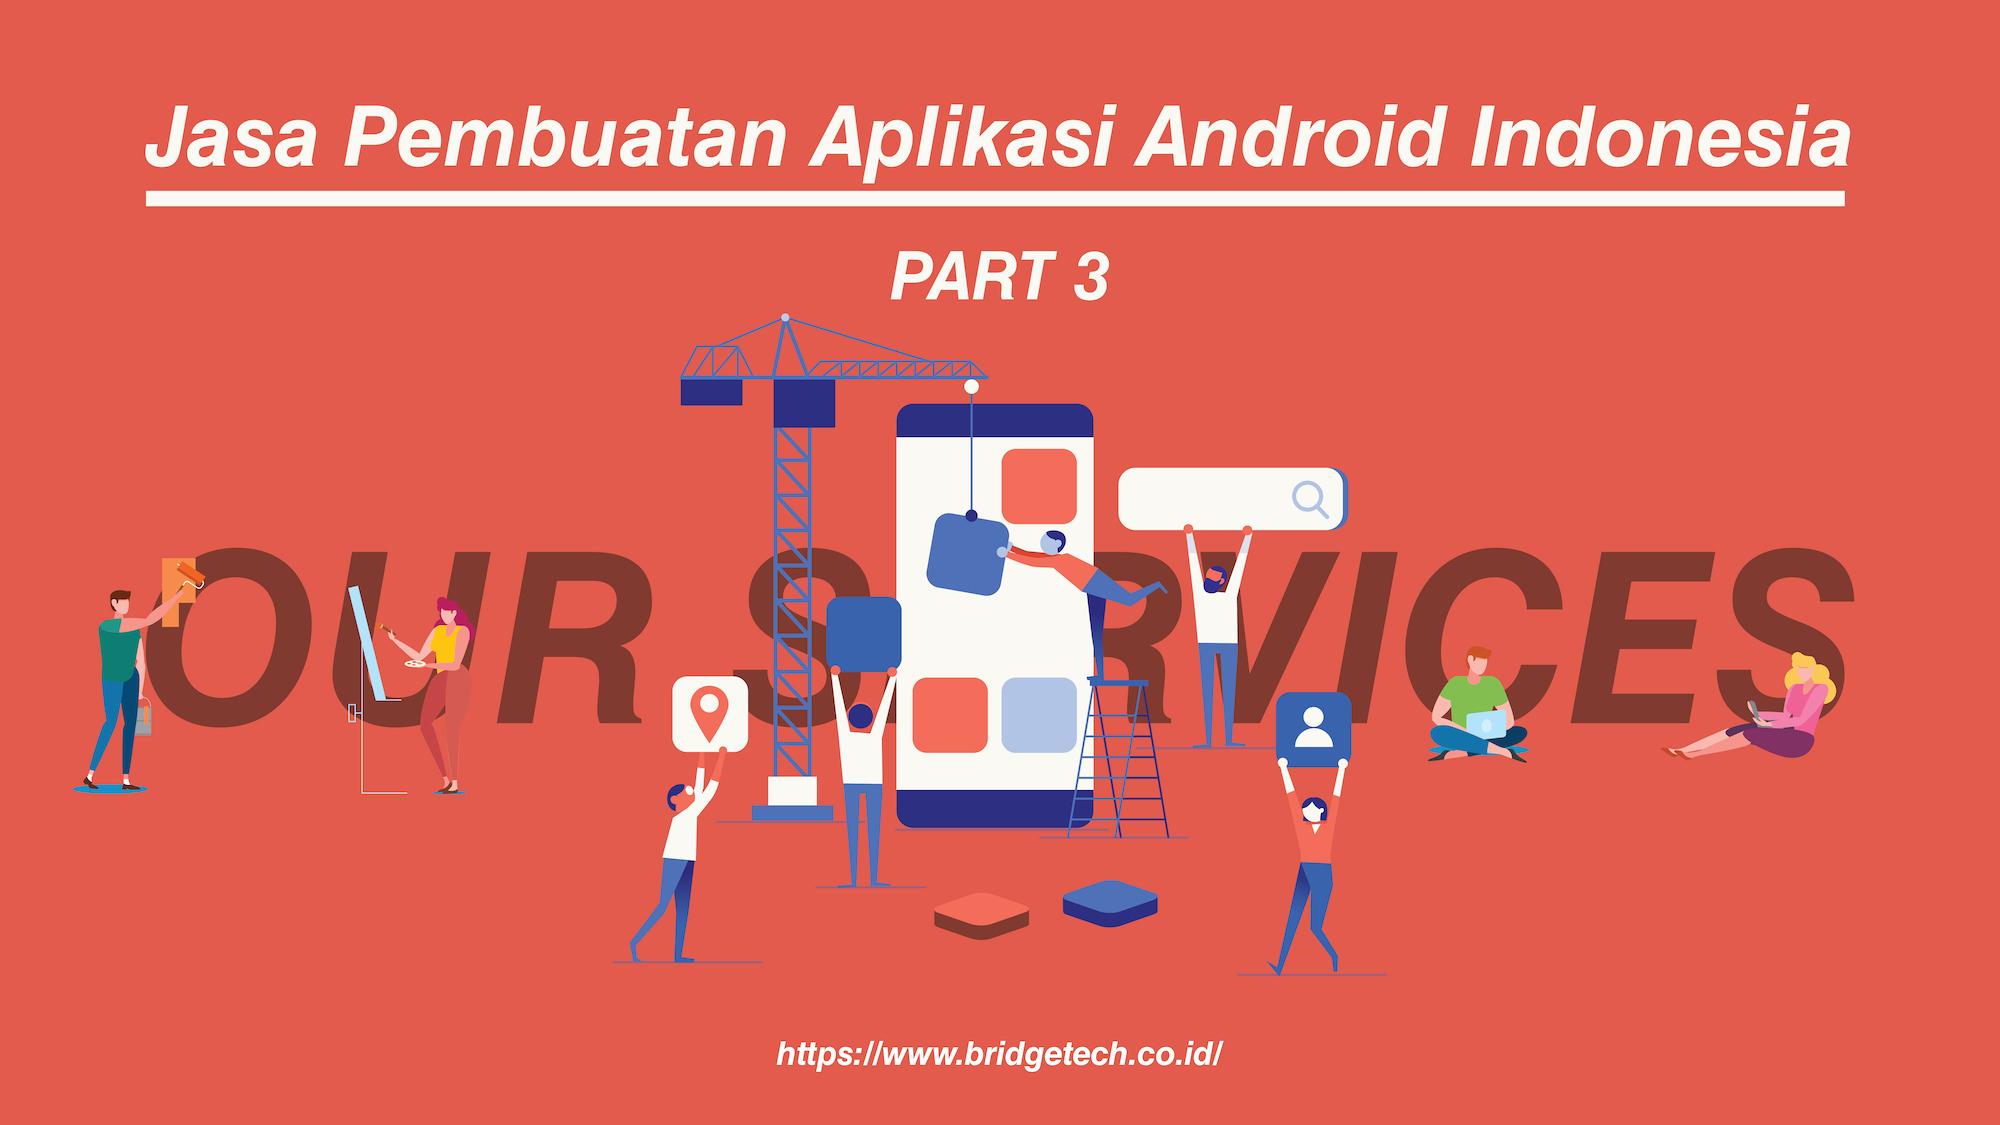 Jasa Pembuatan Aplikasi Android Indonesia (Pt.3)